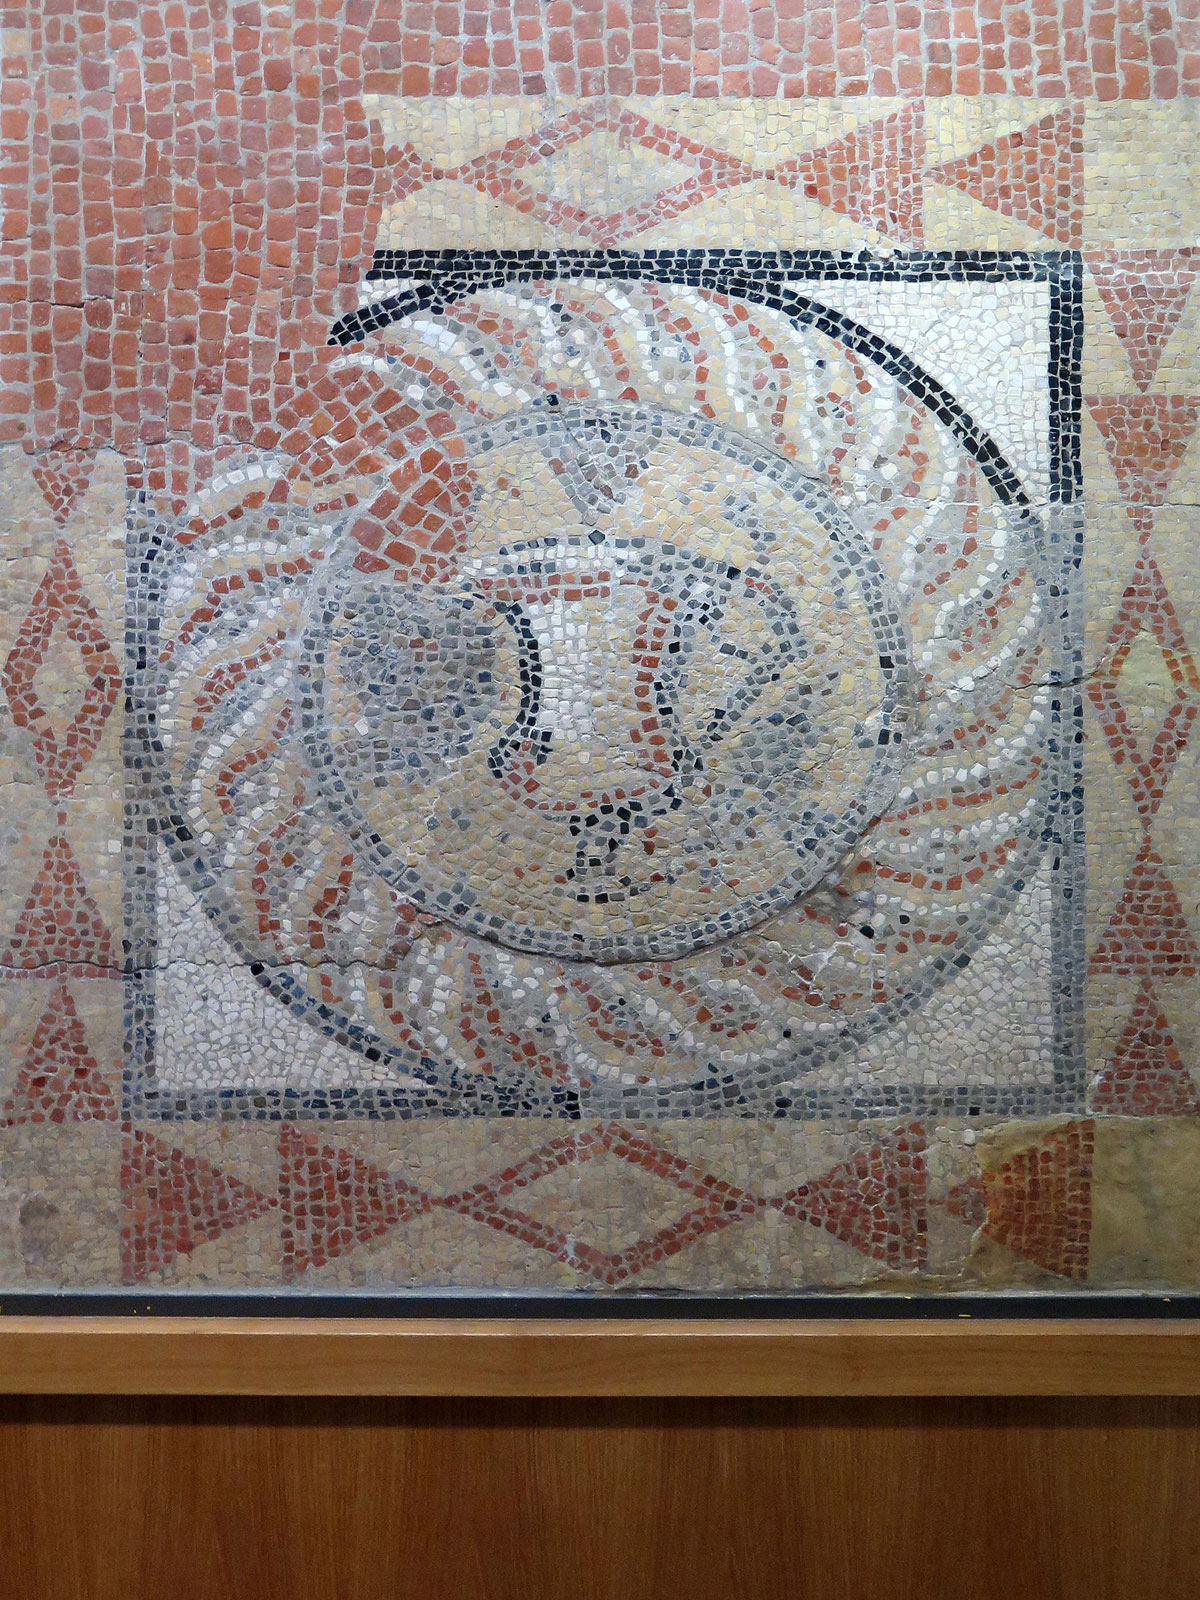 Roman Mosaic found in Burgate Street